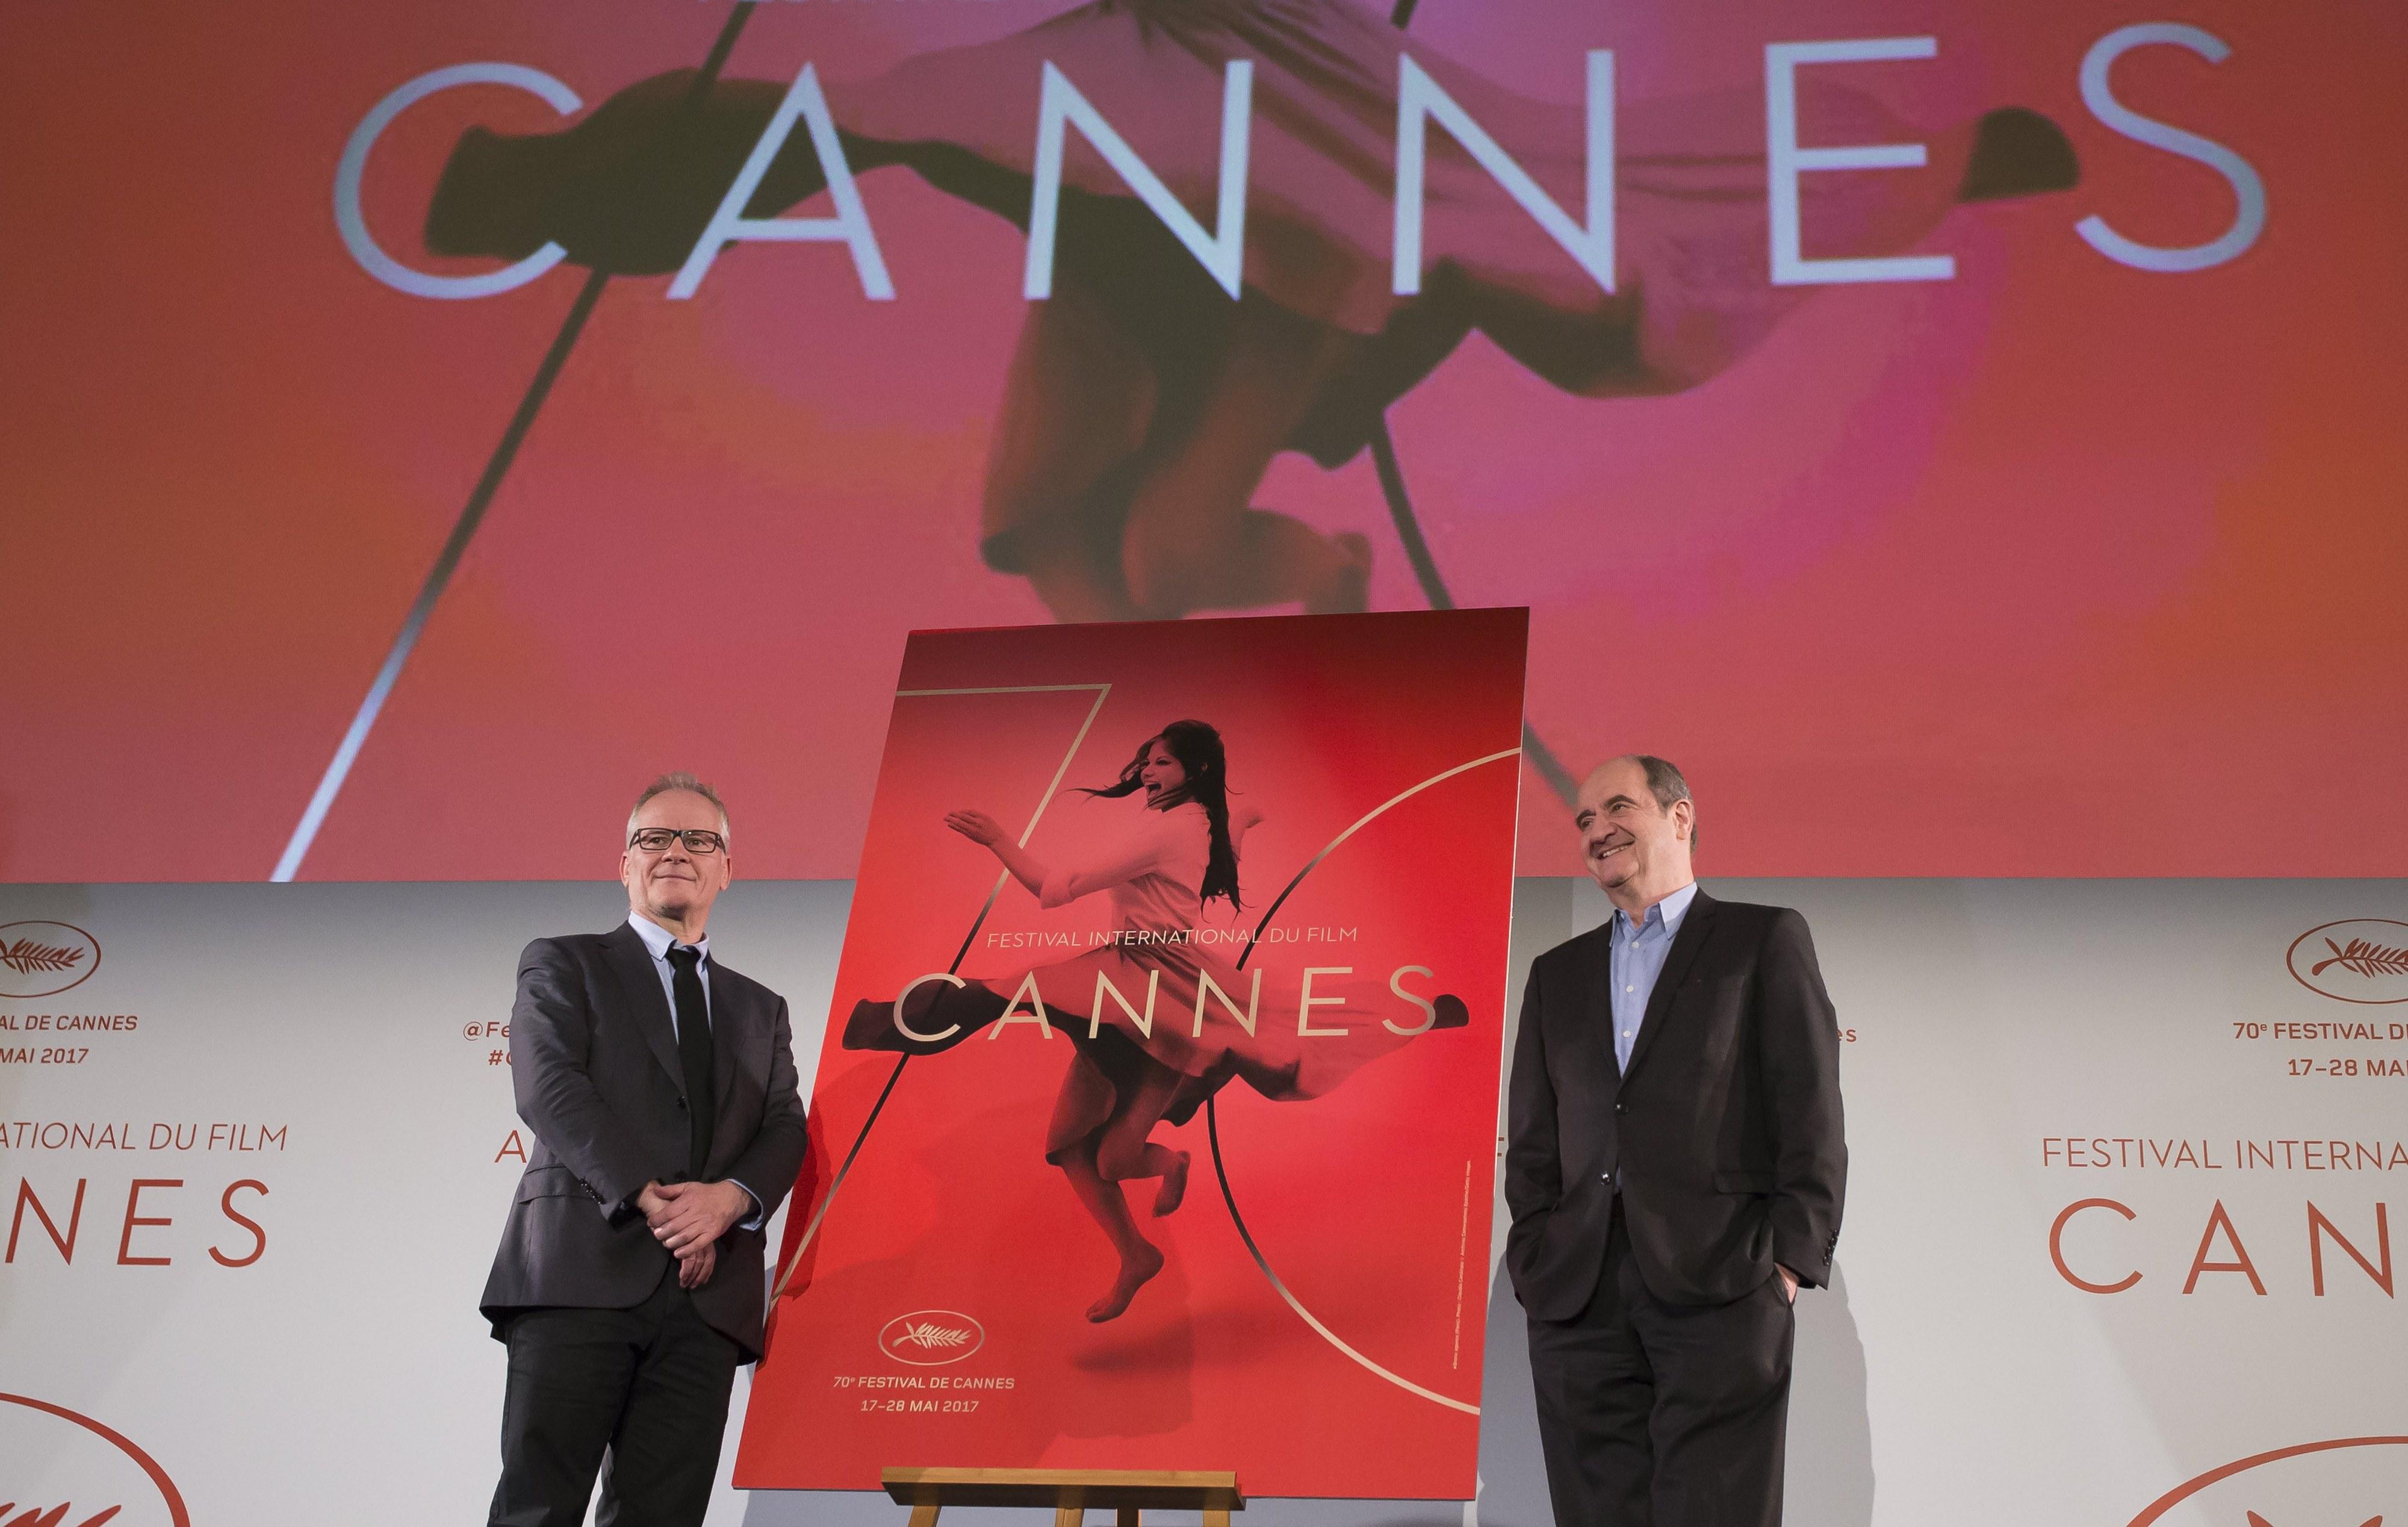 Festival de Cinema de Cannes acrescenta novo filme de Roman Polanski ao programa